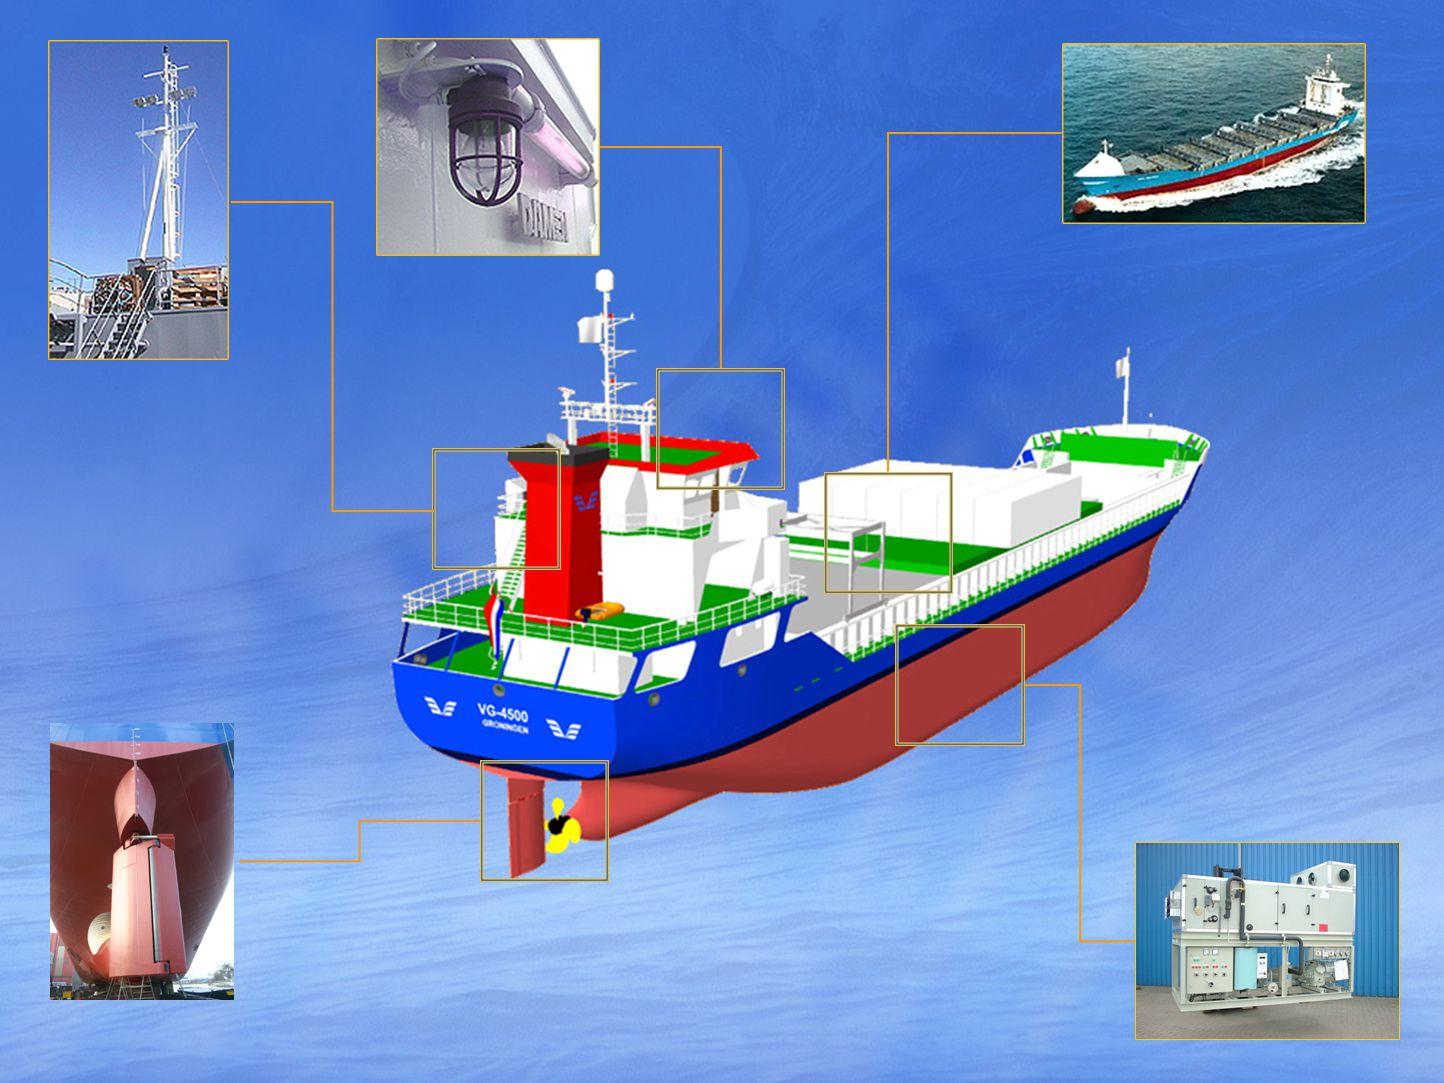 Dagin Marine Technology CONTACT ADDRESS AND PERSON: Dagin Marine Technology Mr.